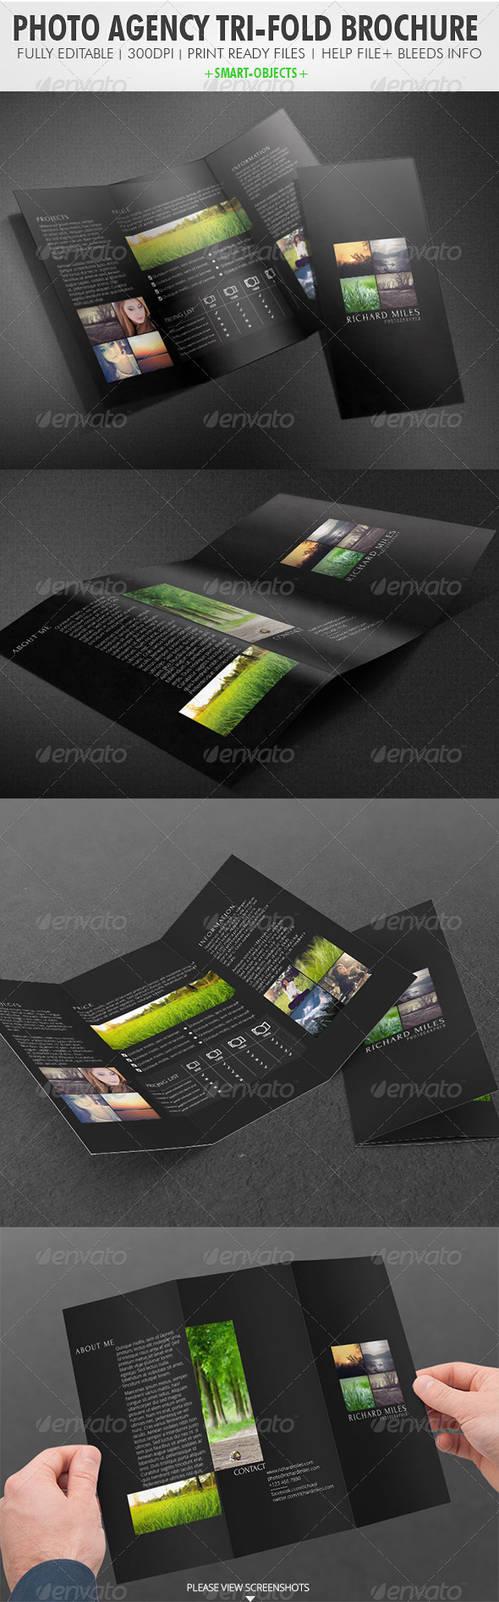 Photo Agency Tri-fold Brochure by vitalyvelygo